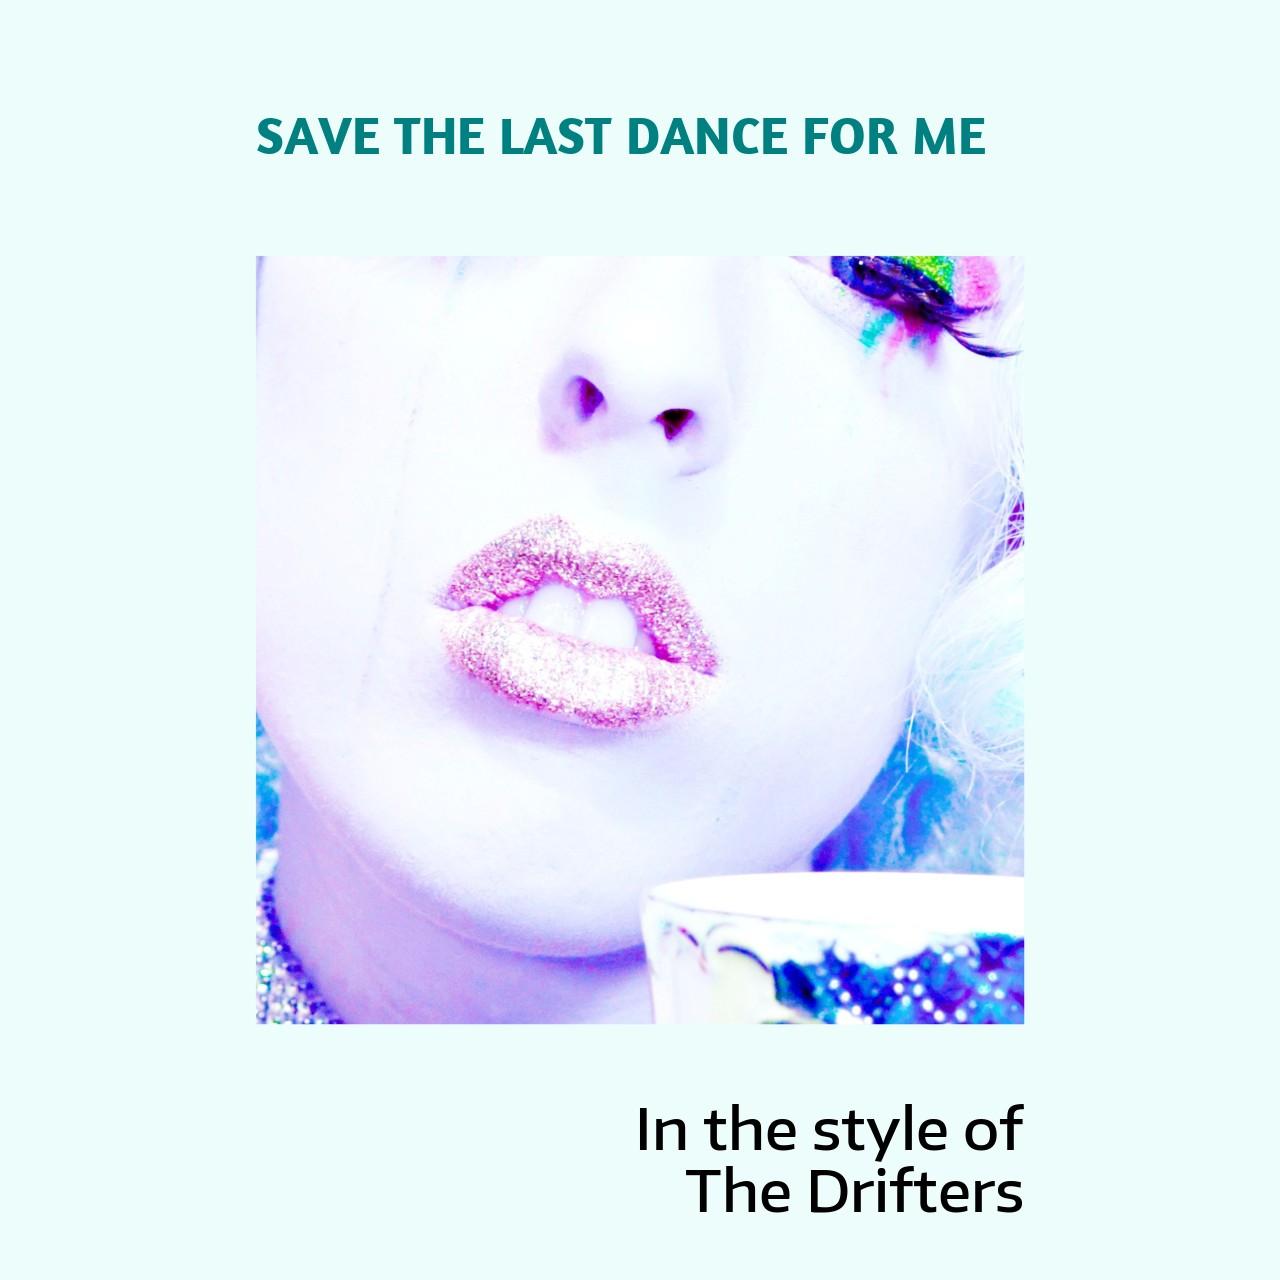 Save the last dance for me karaoke